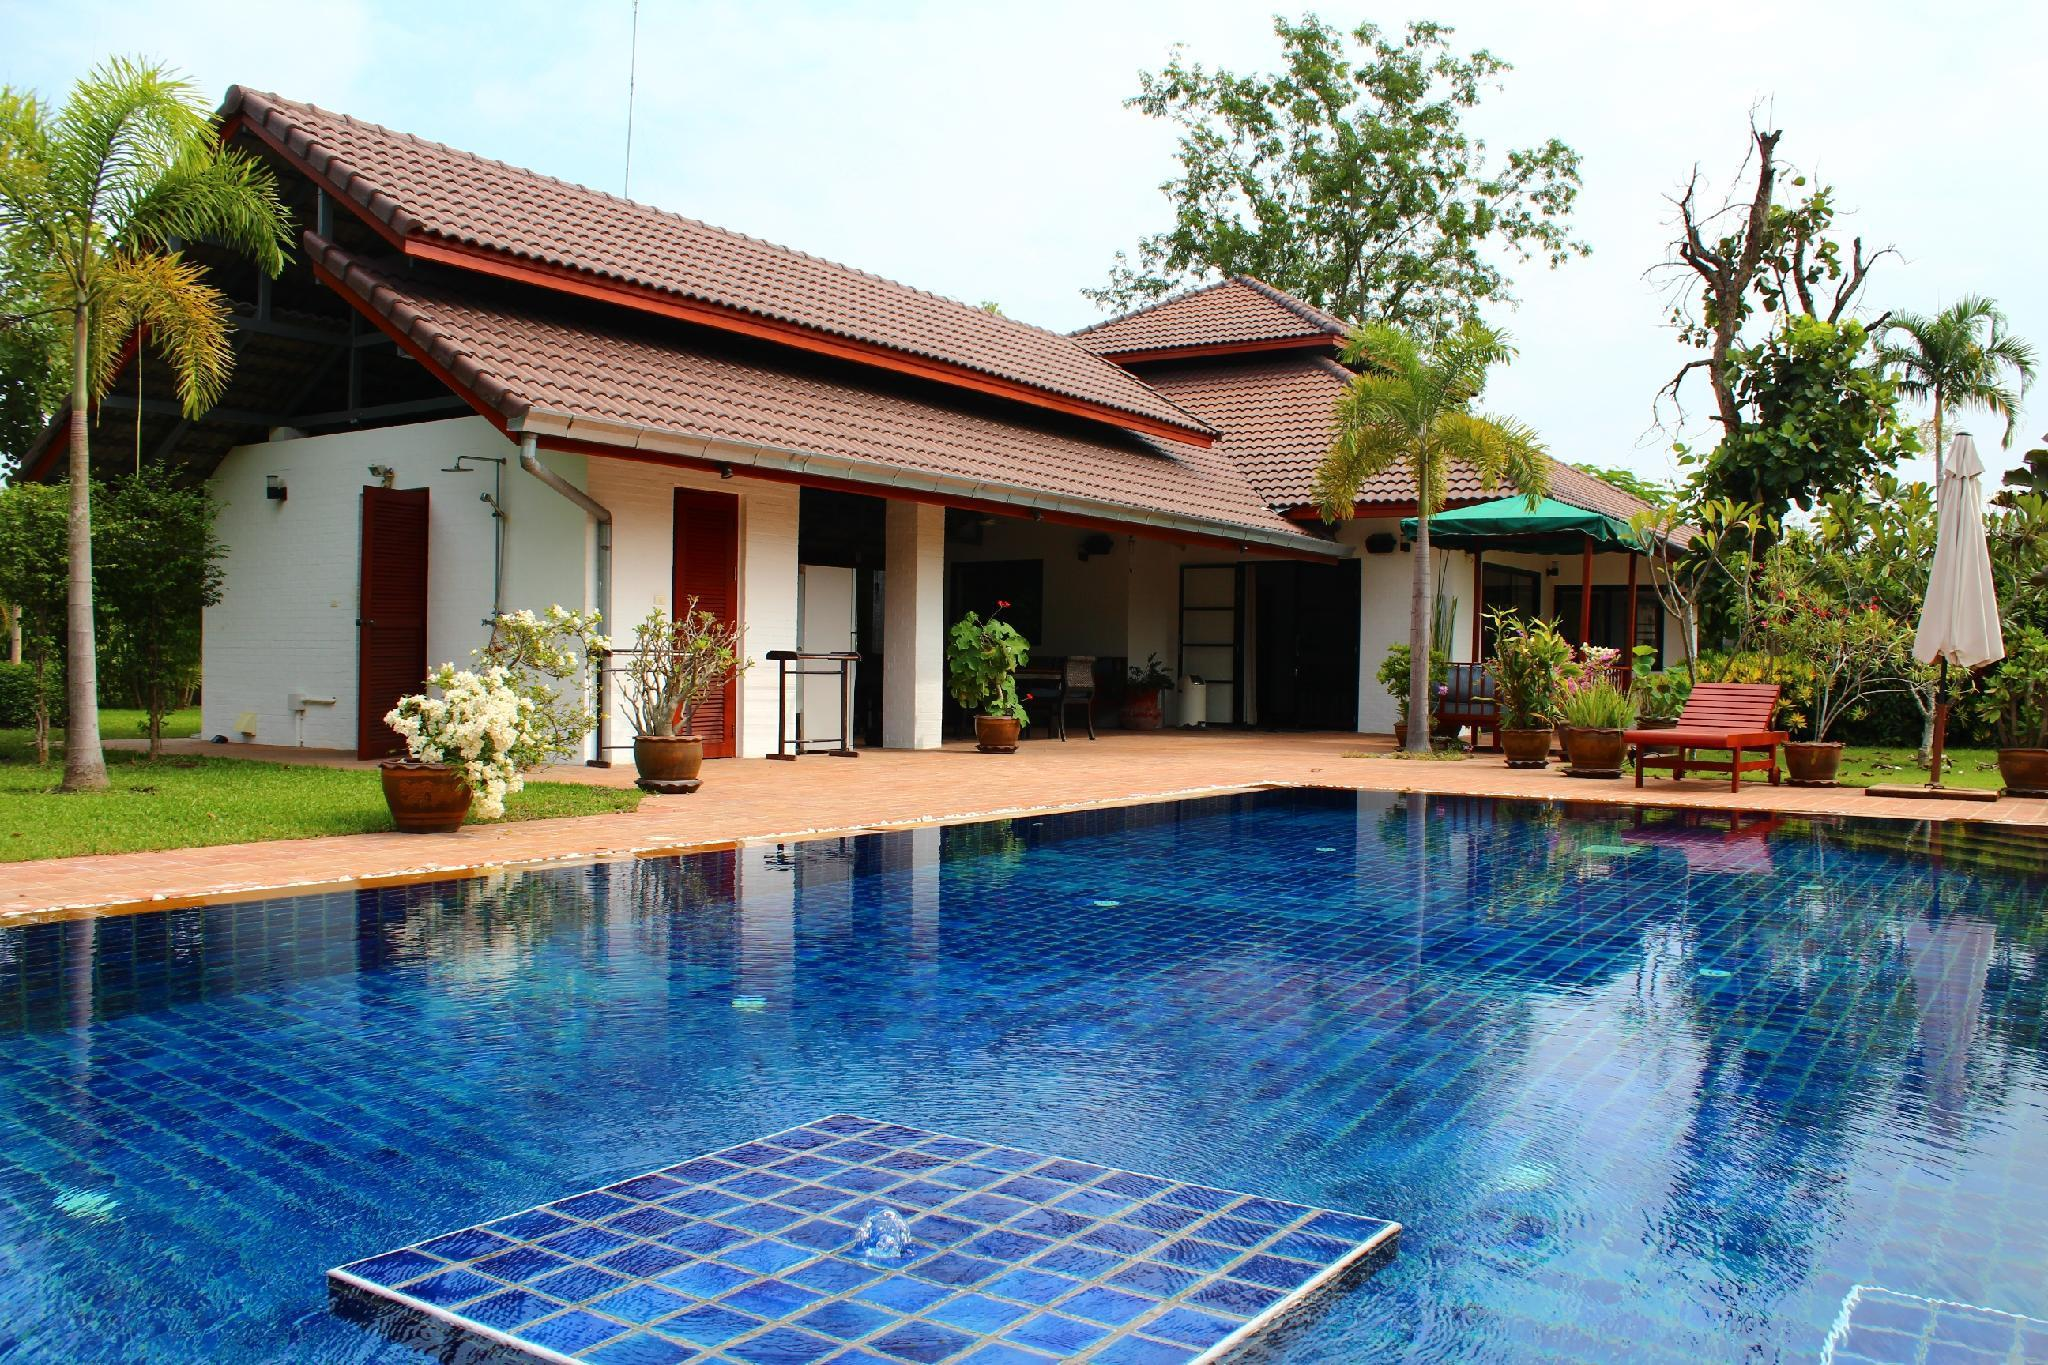 Luxury Villa with swimming pool near Chiang Mai วิลลา 3 ห้องนอน 4 ห้องน้ำส่วนตัว ขนาด 4000 ตร.ม. – หางดง